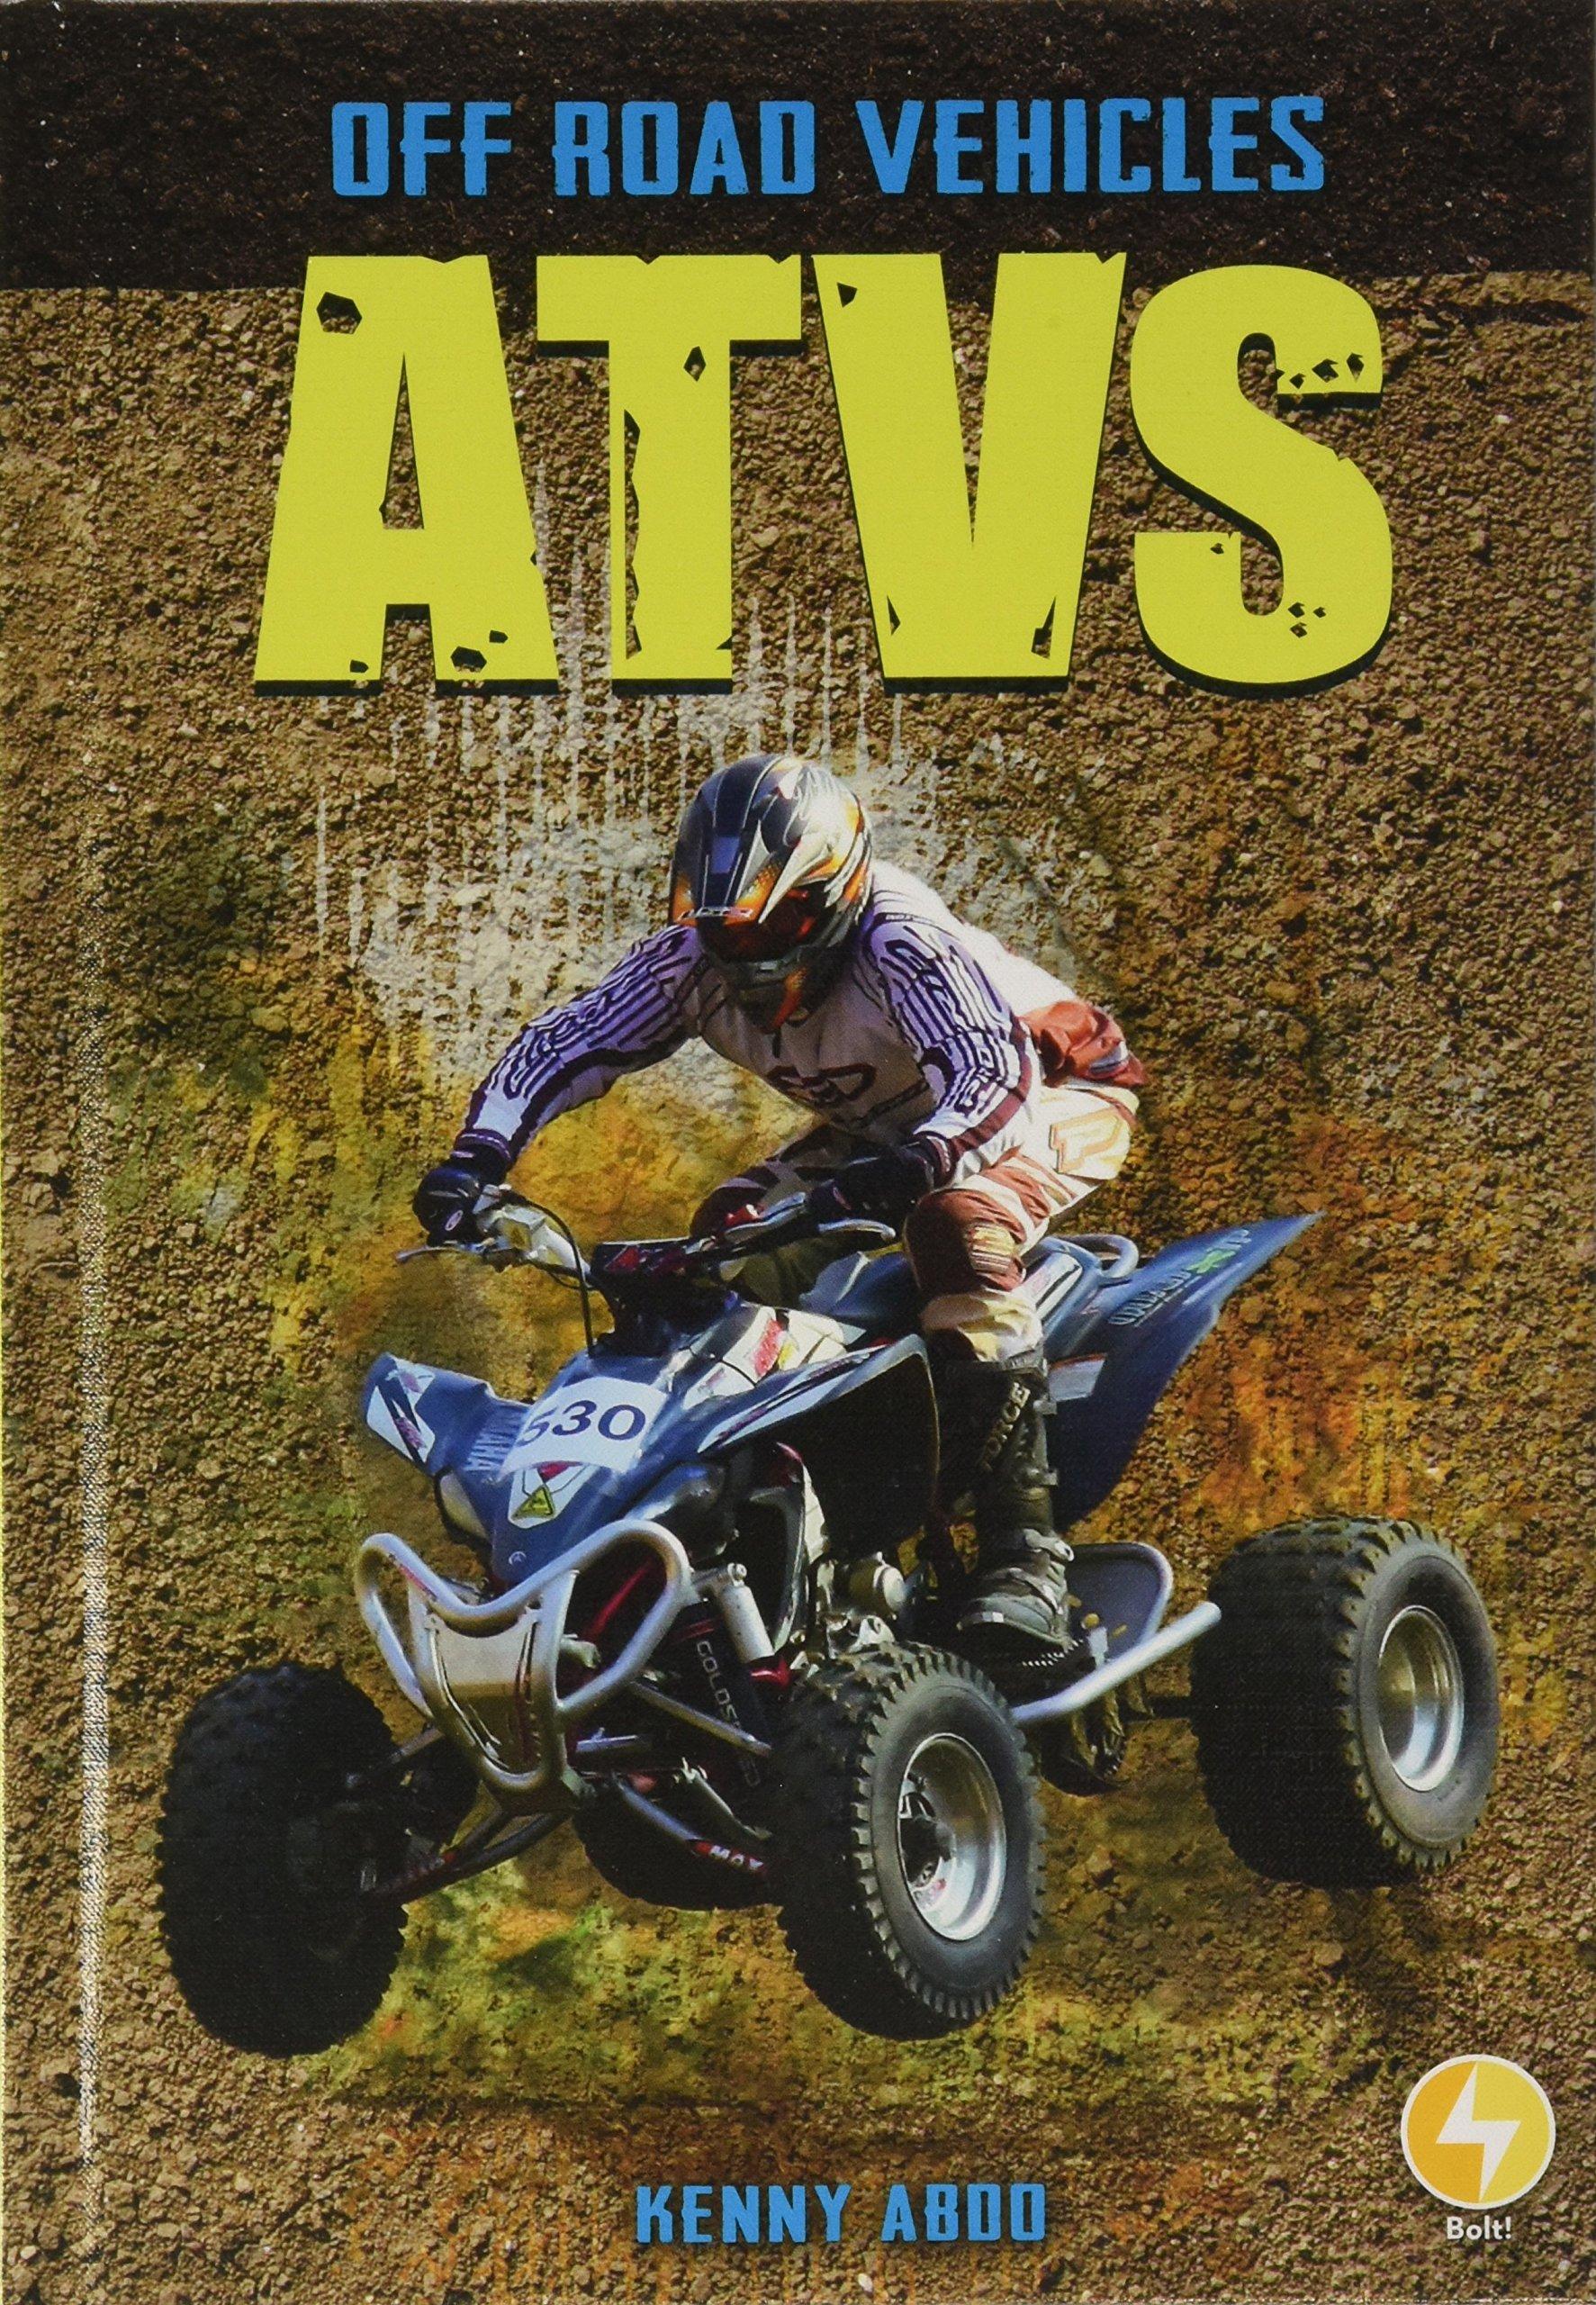 ATVs (Off Road Vehicles)